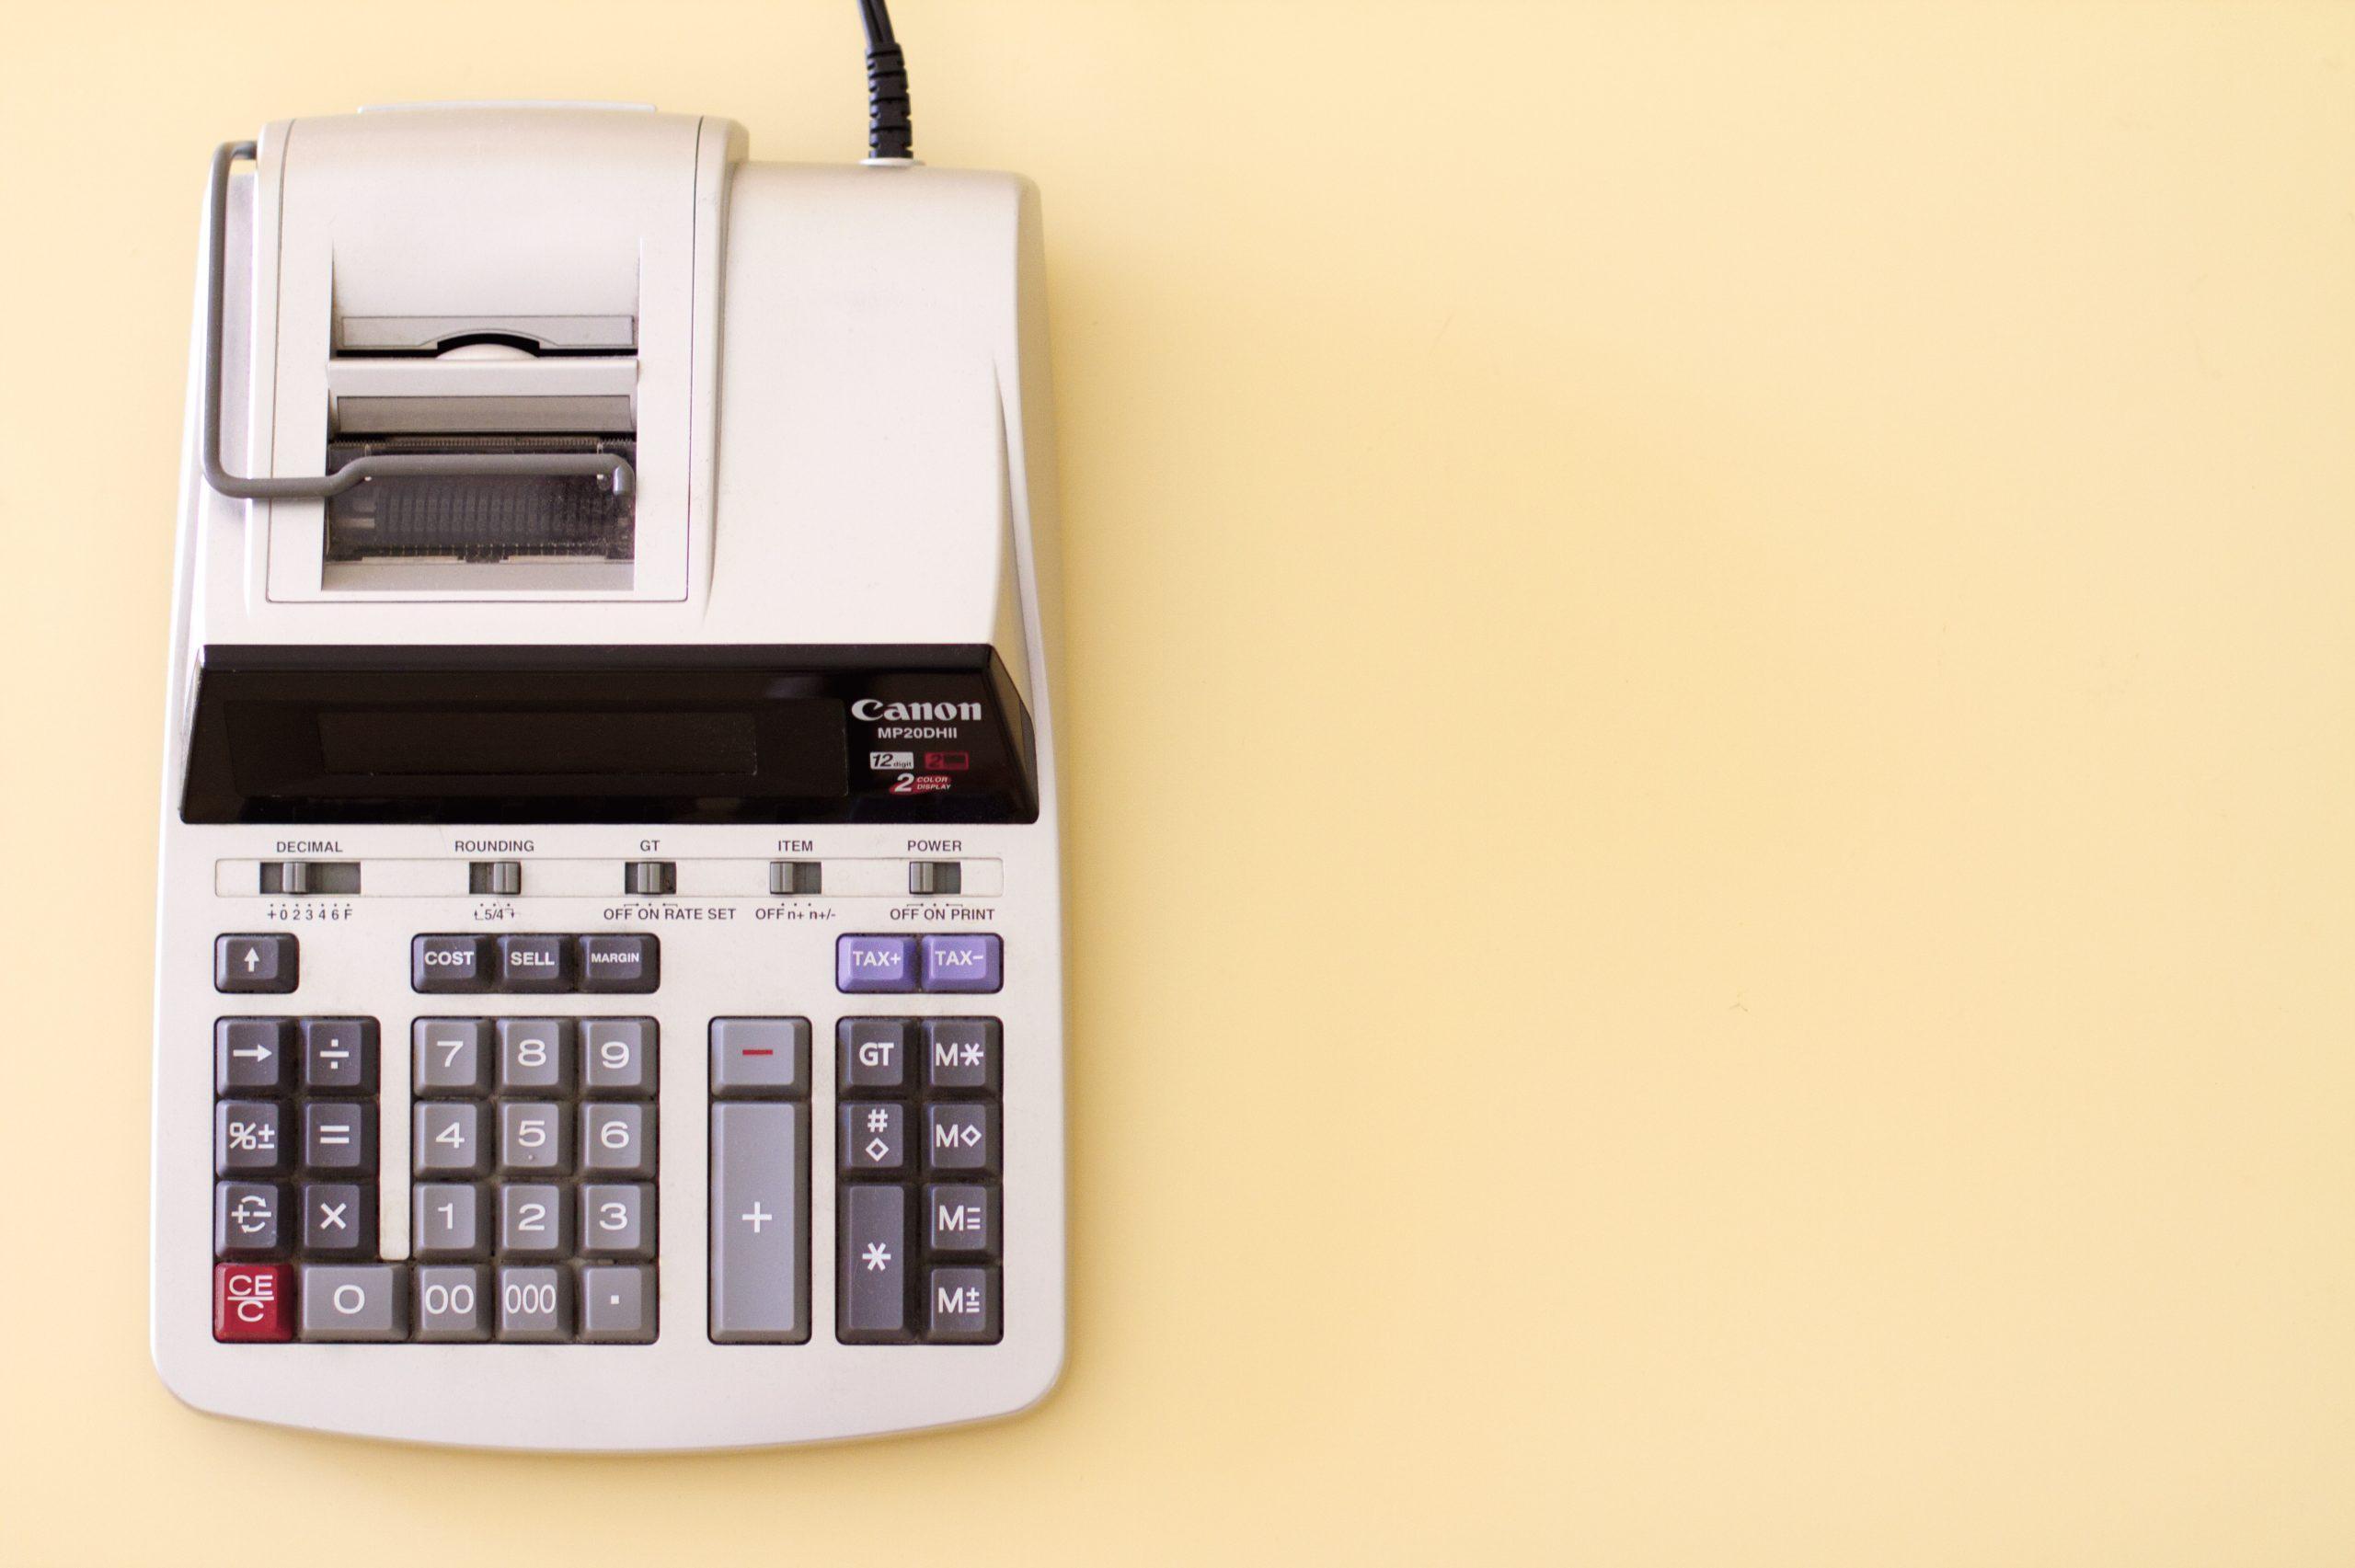 Bank Of Scotland Loan Calculator